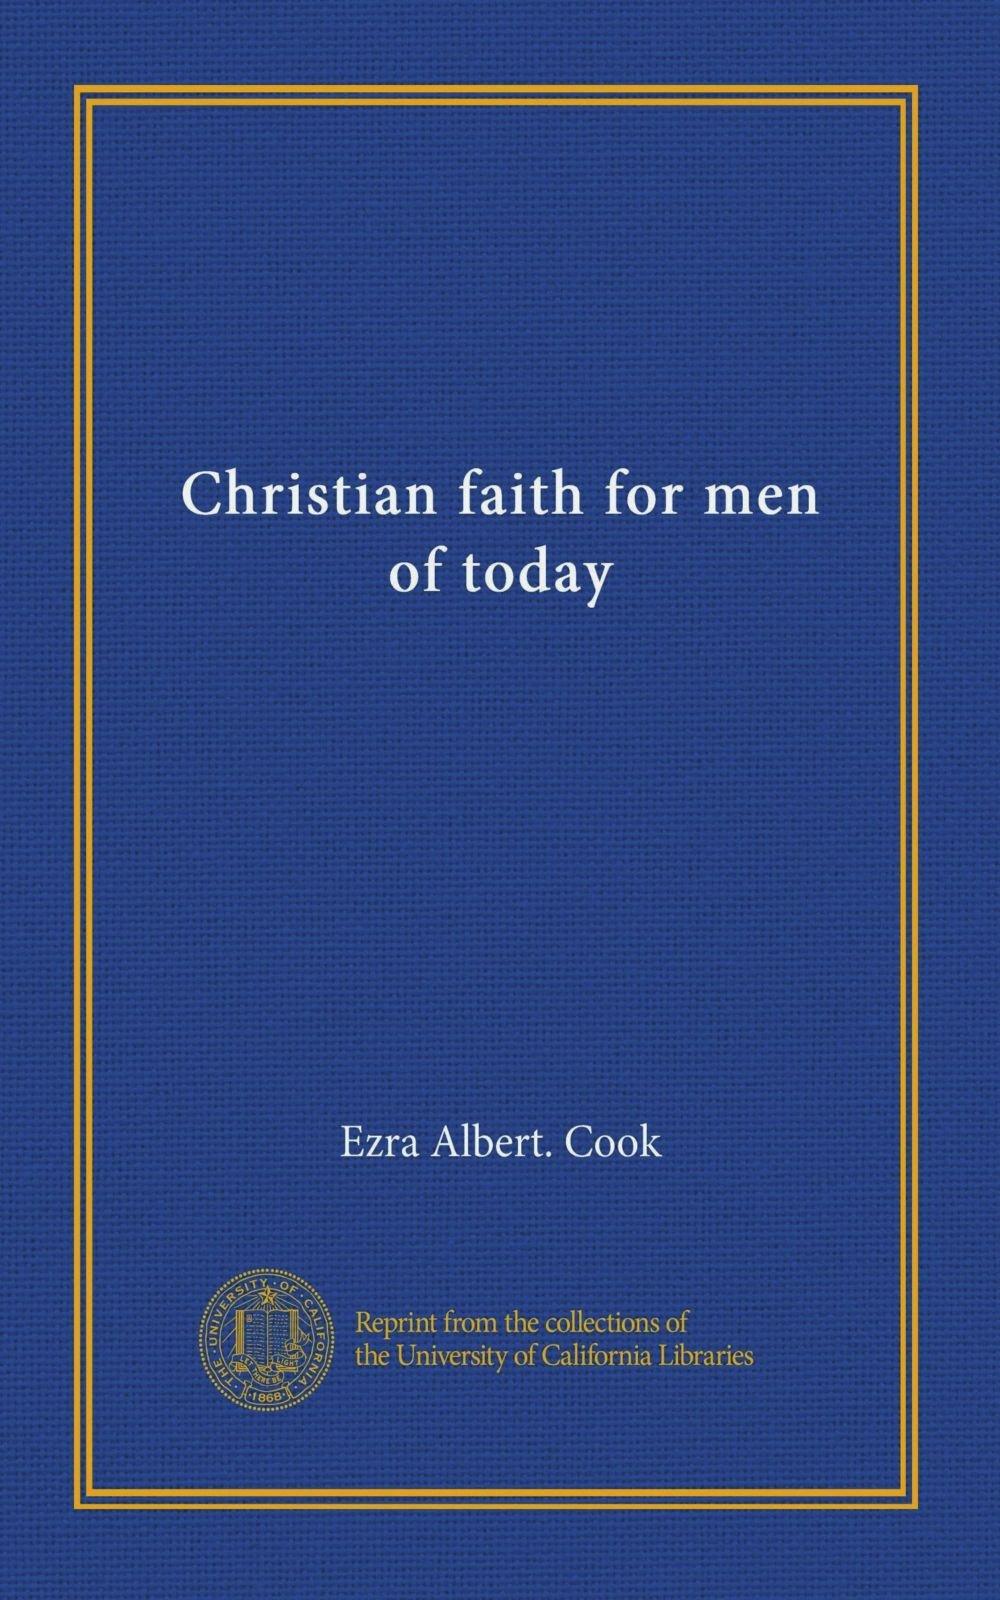 Christian faith for men of today ePub fb2 ebook